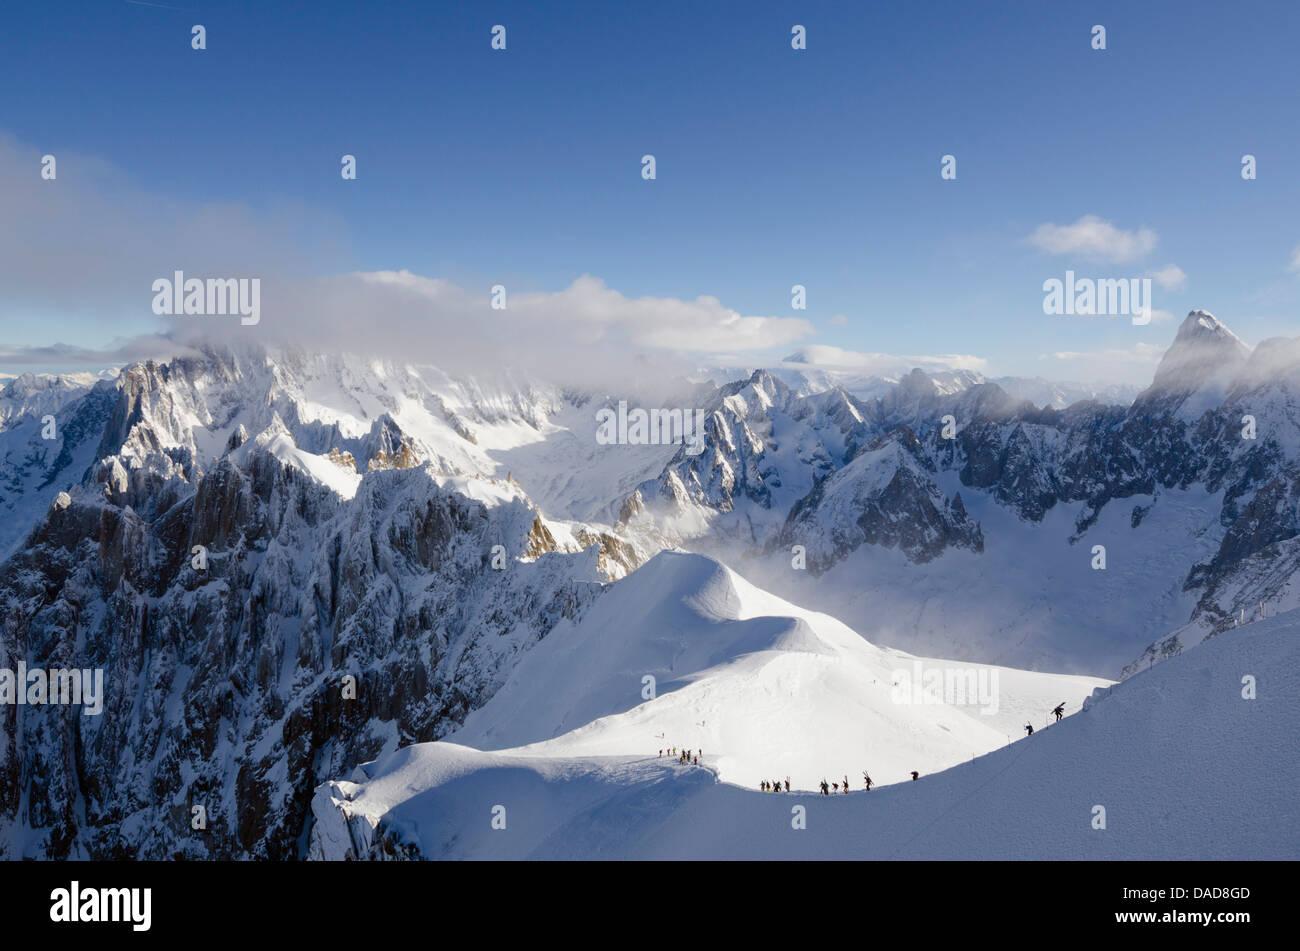 Aiguille du Midi ridge, Chamonix, Haute-Savoie, French Alps, France, Europe - Stock Image